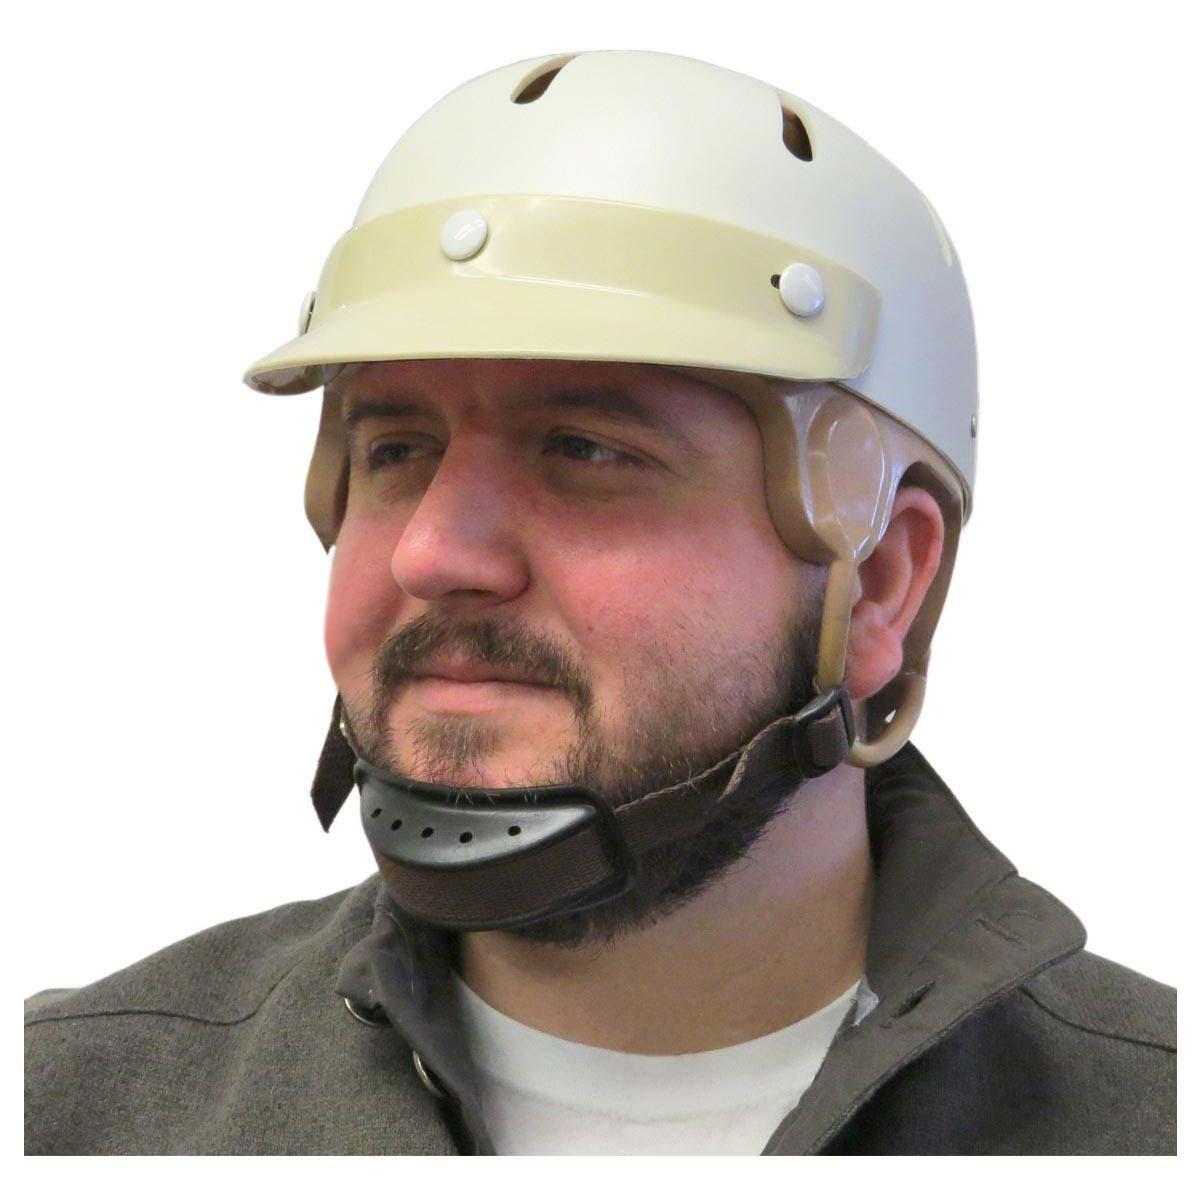 Danmar Deluxe Hard Shell Helmet | Danmar Products 9825-bu